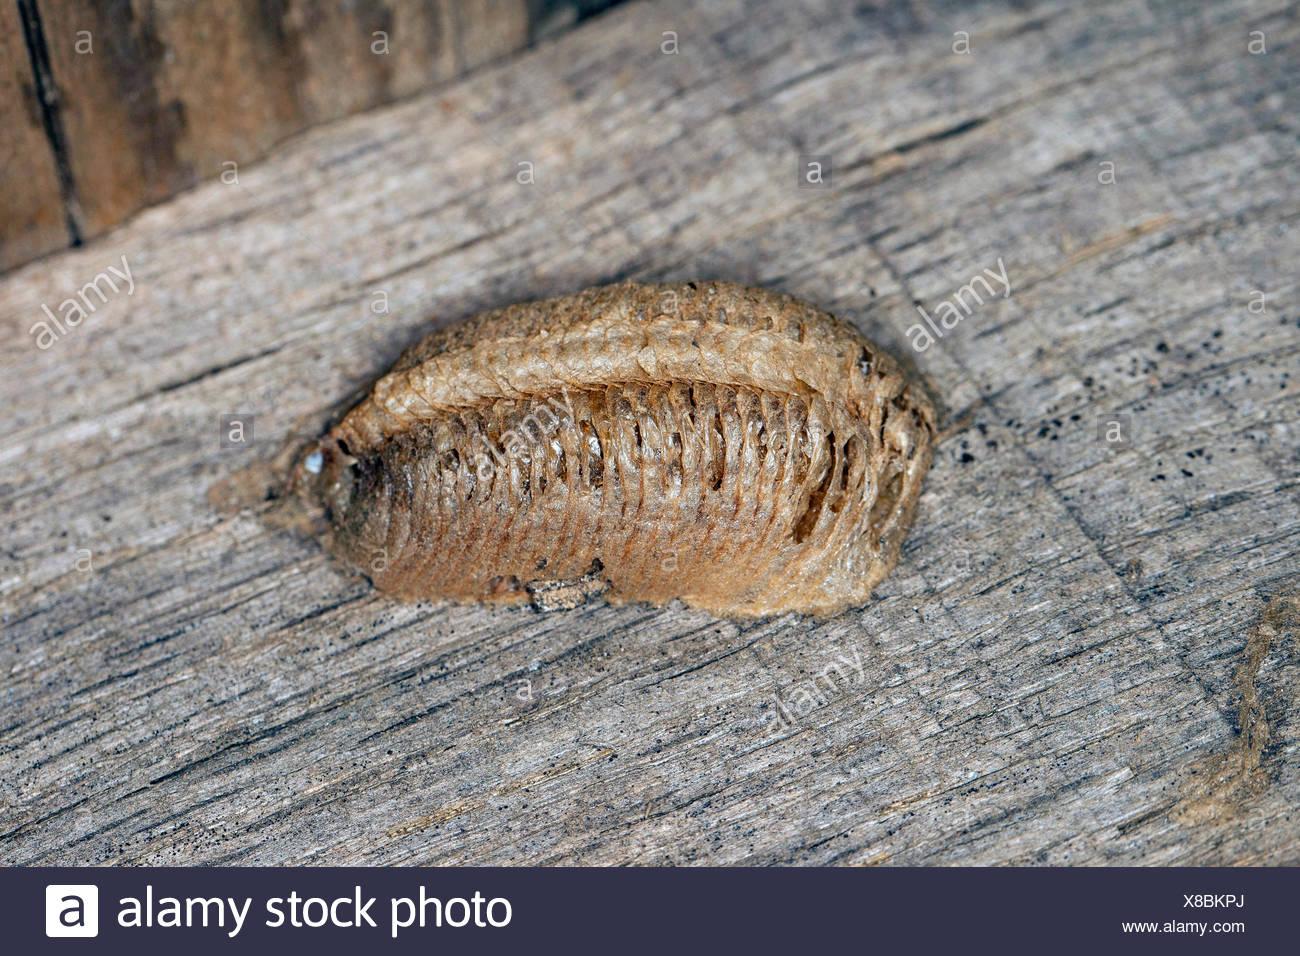 European preying mantis (Mantis religiosa), cocoon, Germany - Stock Image